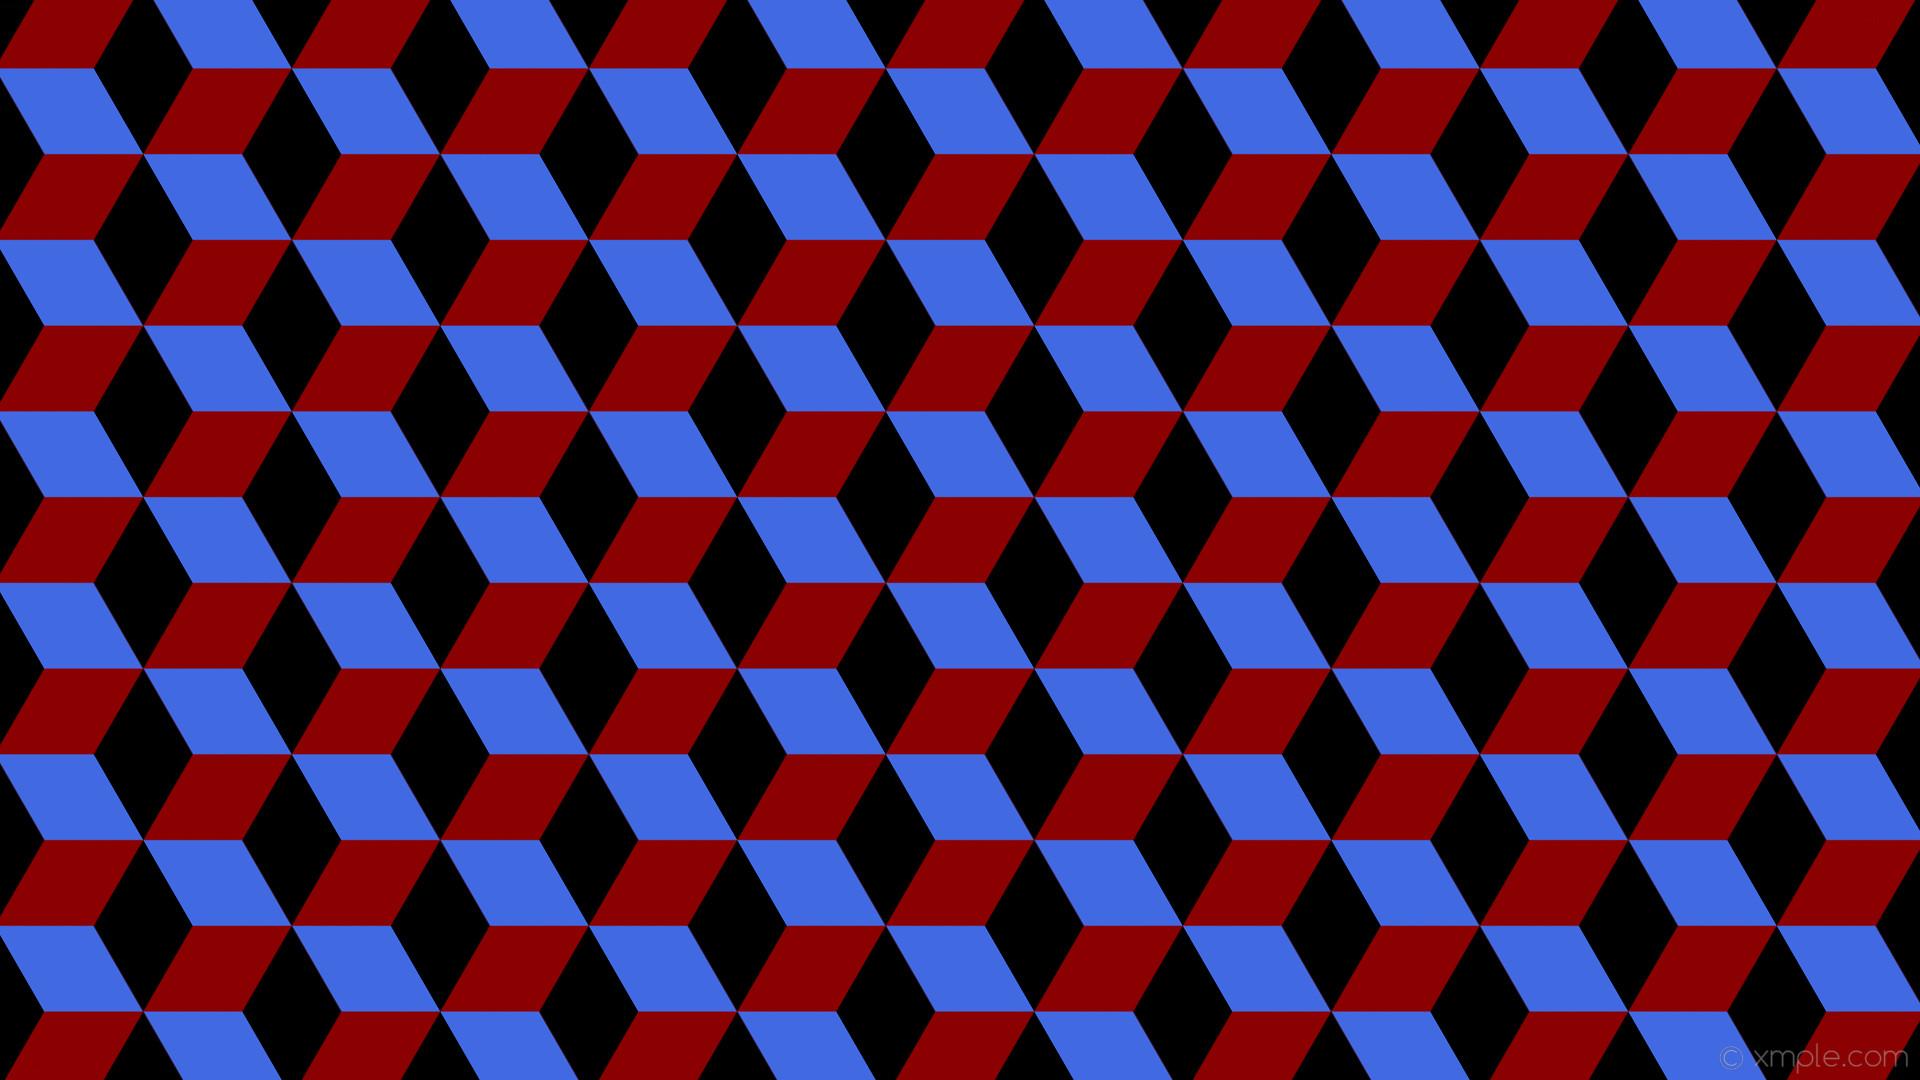 wallpaper blue 3d cubes red black dark red royal blue #8b0000 #4169e1  #000000